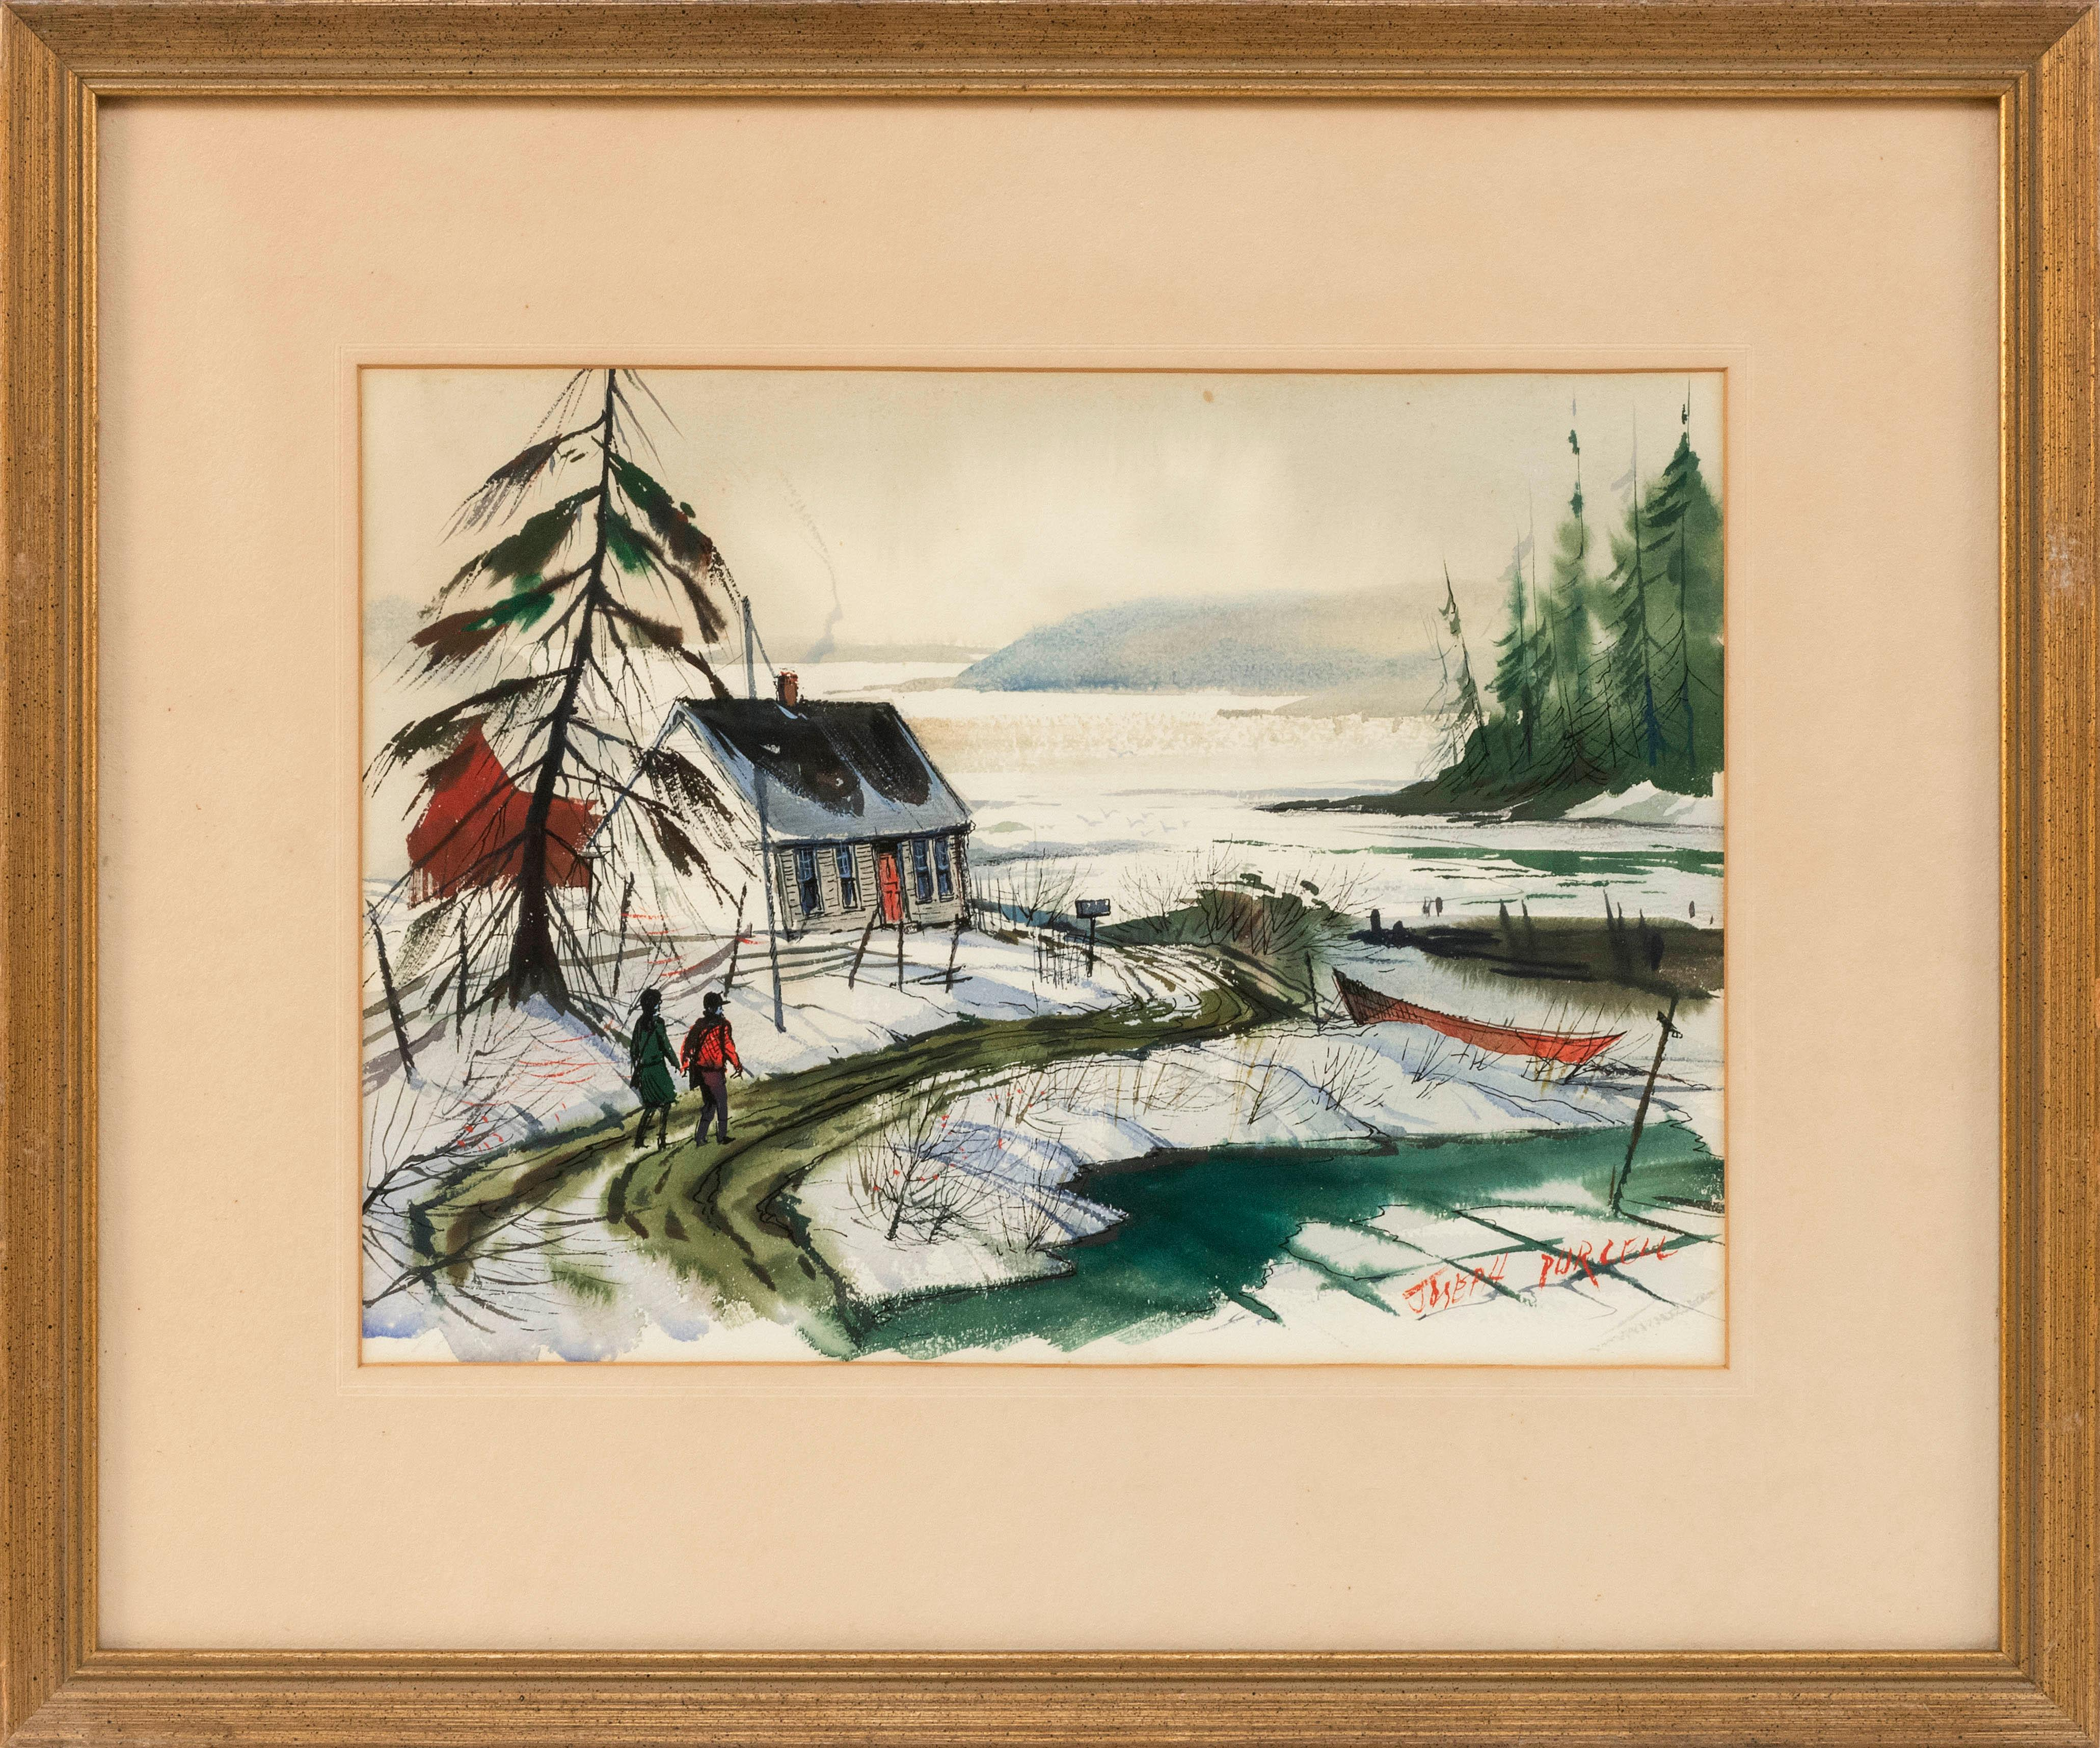 "JOSEPH DOUGLAS PURCELL, Canada, 1927-2015, ""Mahone Bay, Nova Scotia"",, Watercolor on paper, 10.5"" x 14"" sight. Framed 18.5"" x 22""."